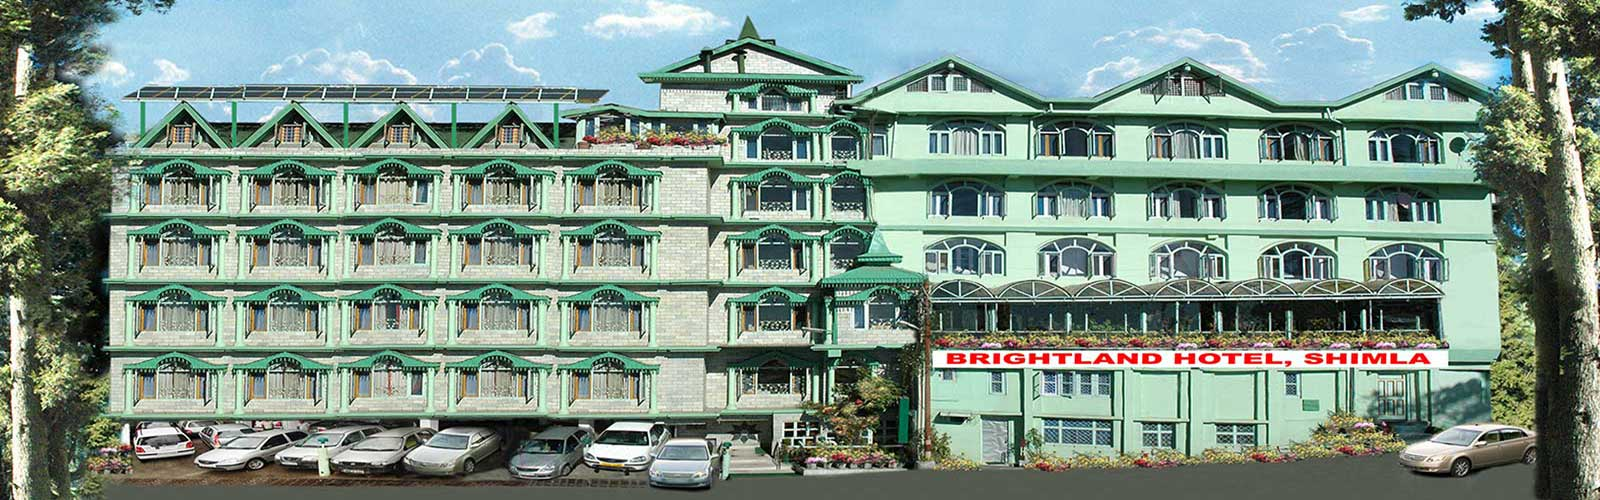 brightland Hotel Big Hotel overview